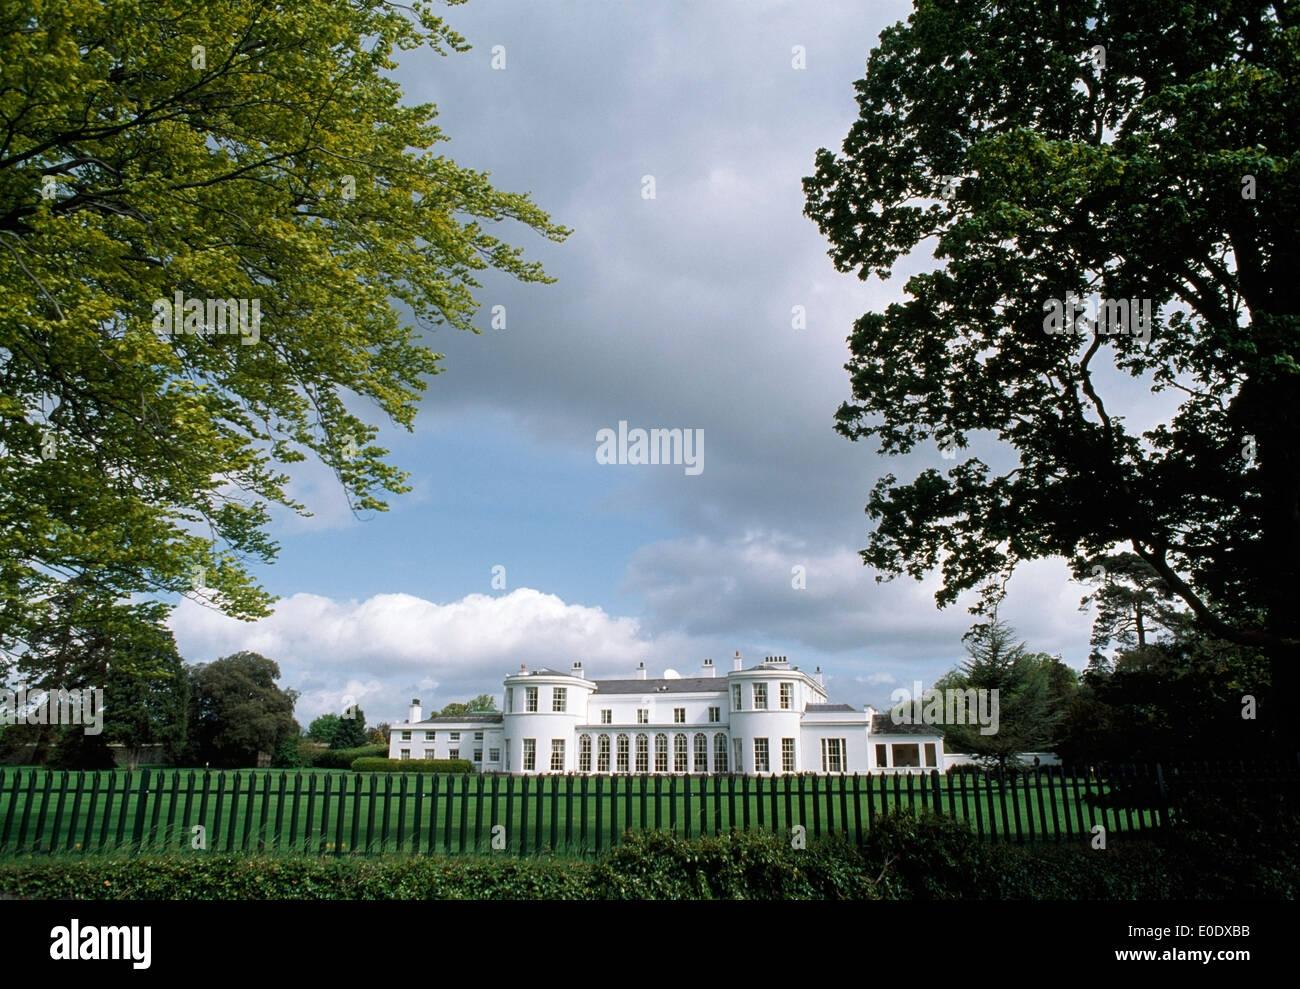 U.S. Ambassador's Residence In Phoenix Park, County Dublin, Ireland Stock Photo